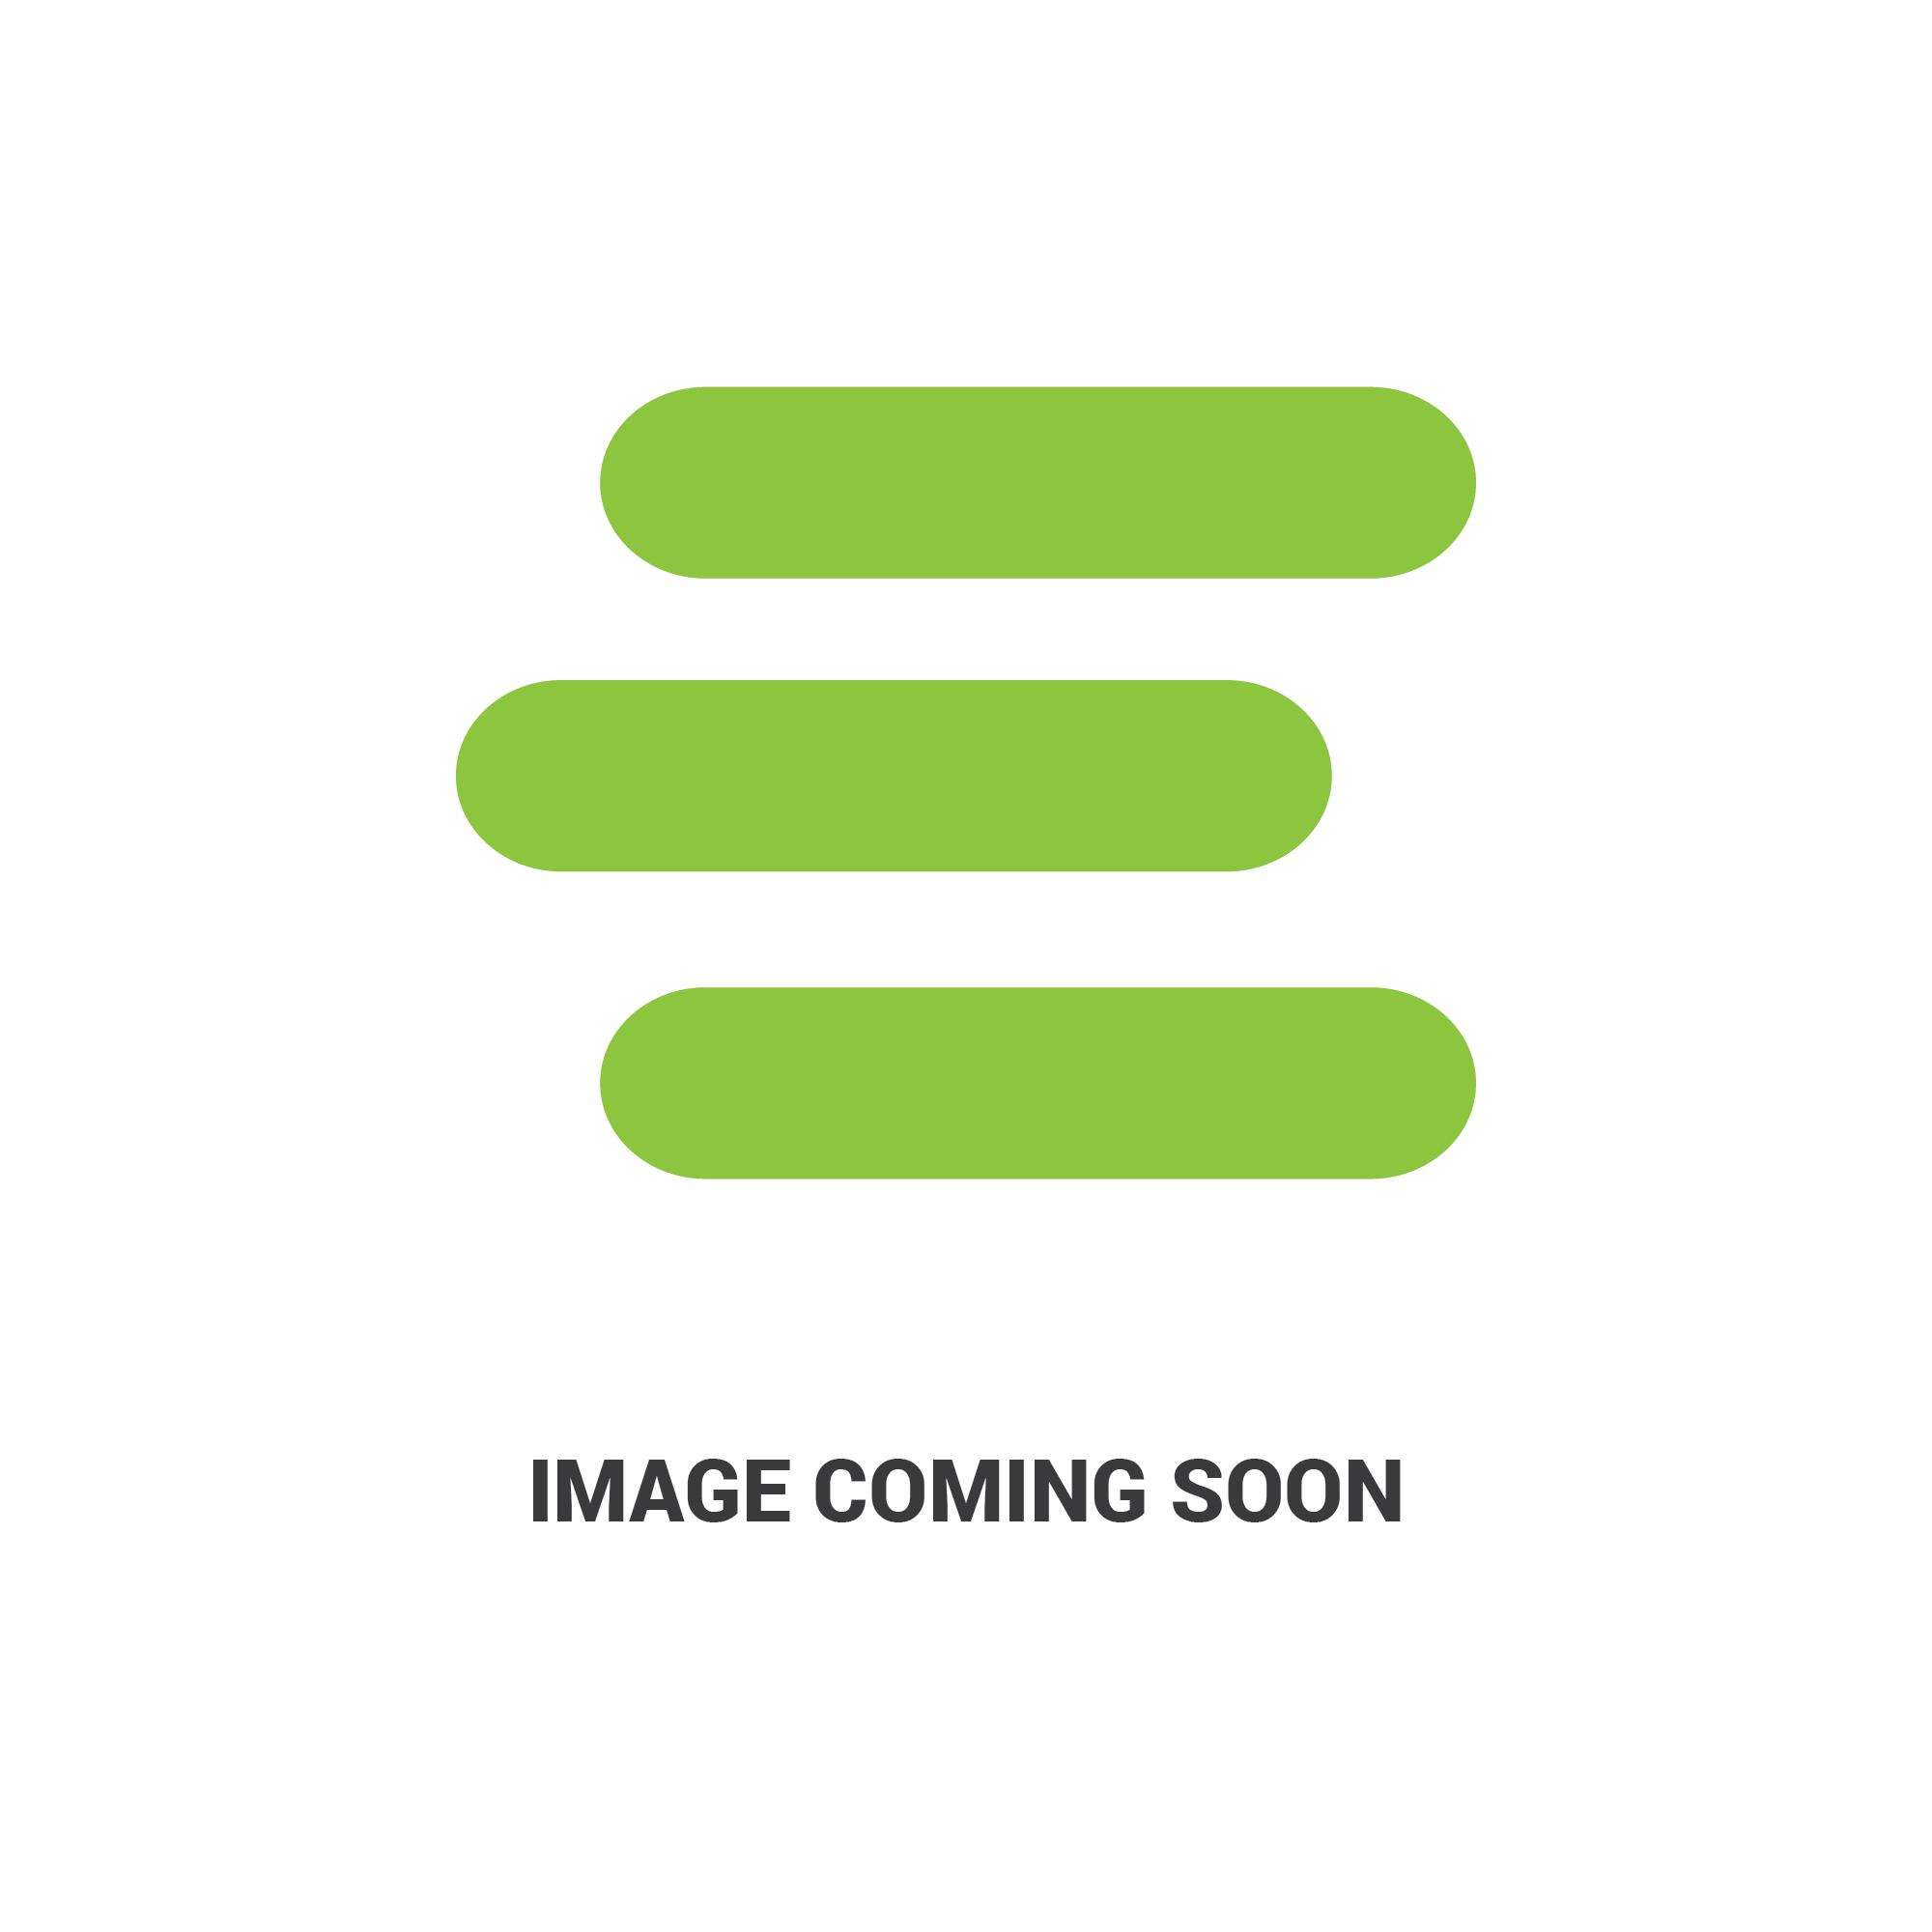 E-53066-0269-MAedit 1171.jpg